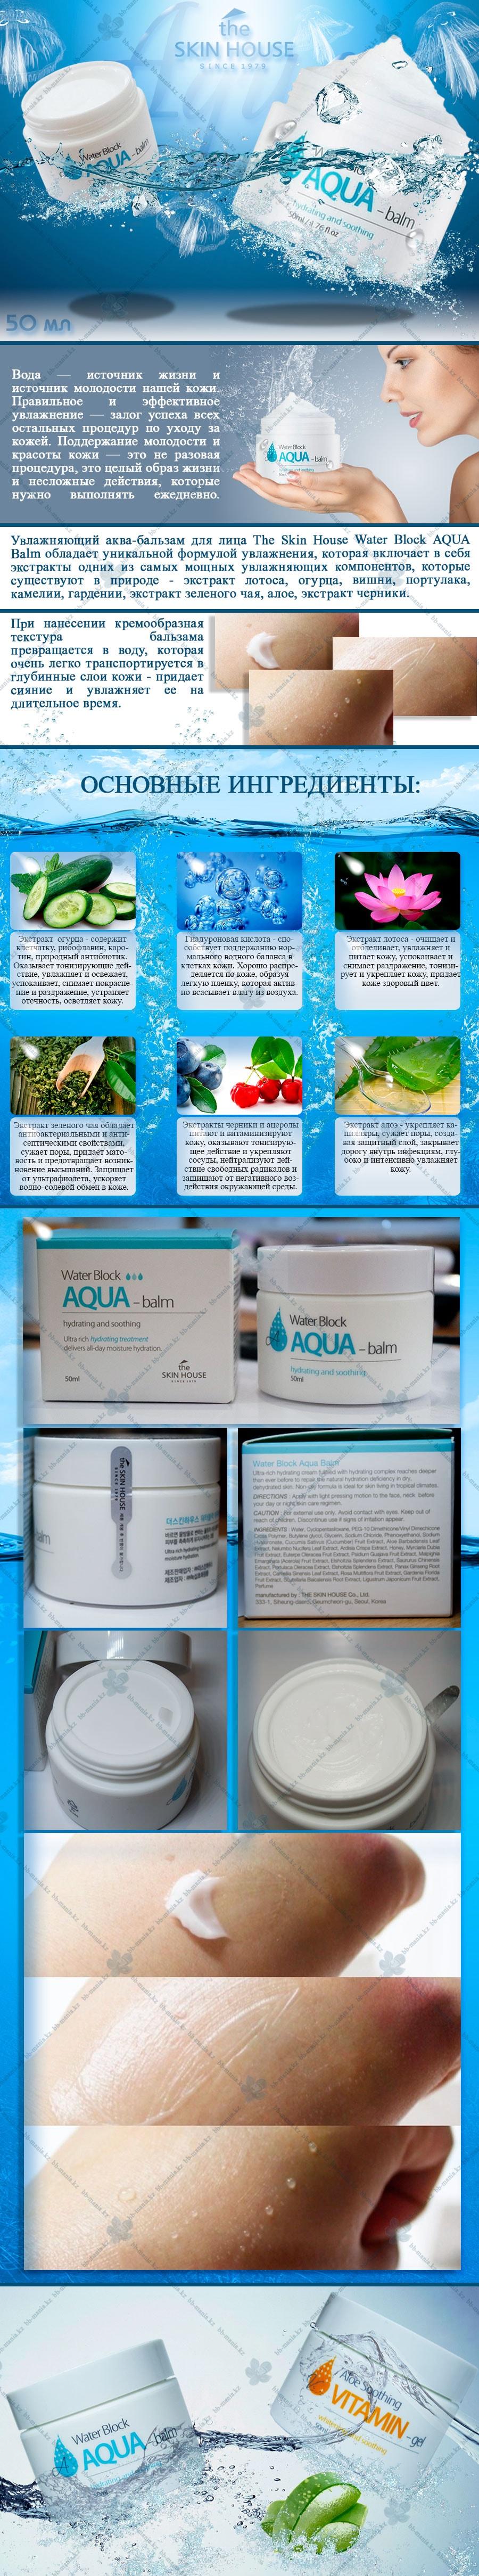 Water-Block-Aqua-Balm-[The-Skin-House]-min